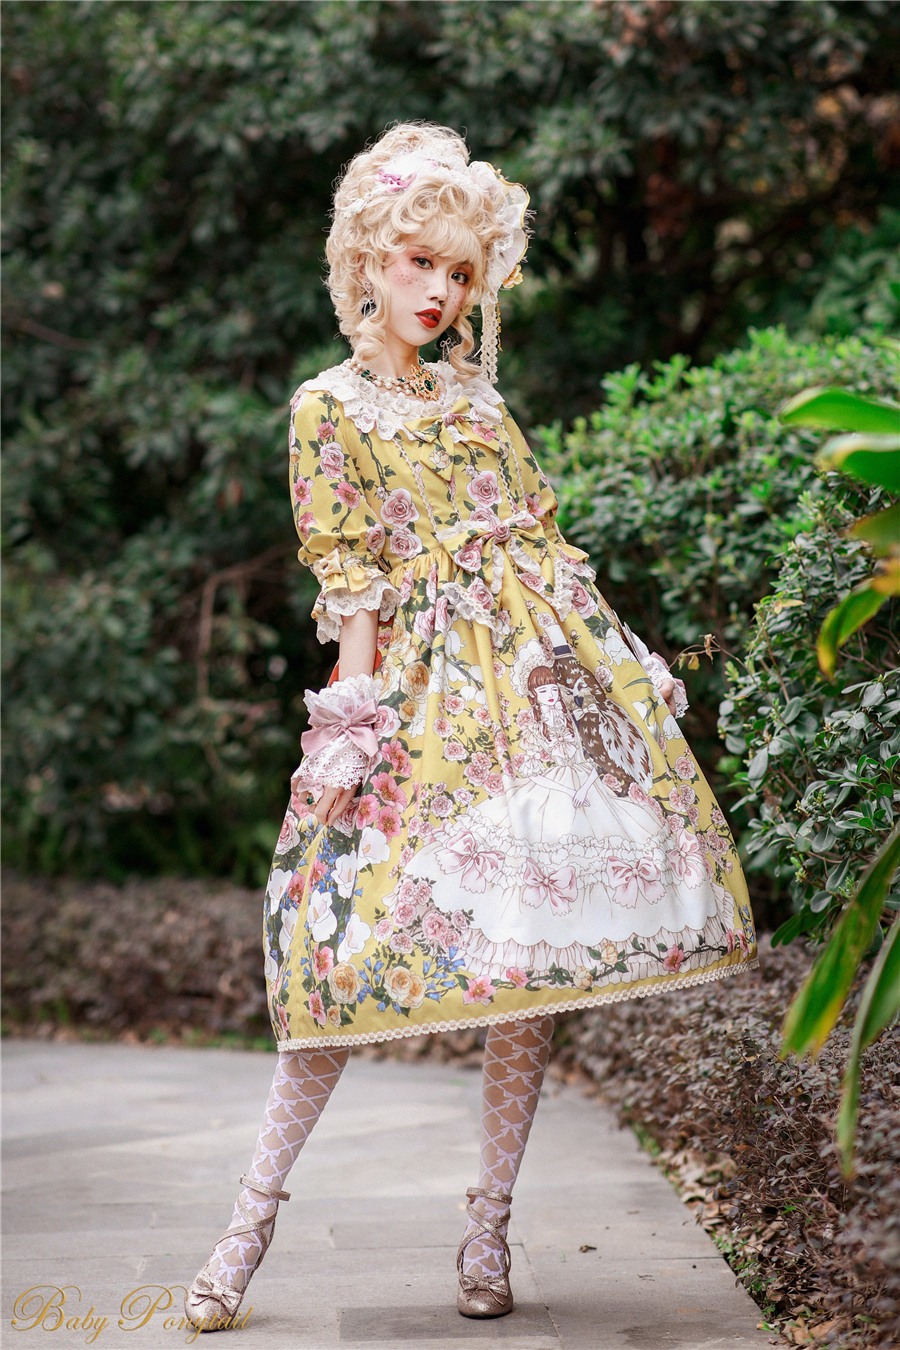 Baby Ponytail_Model Photo_Polly's Garden of Dreams_OP Yellow_Kaka_21.jpg